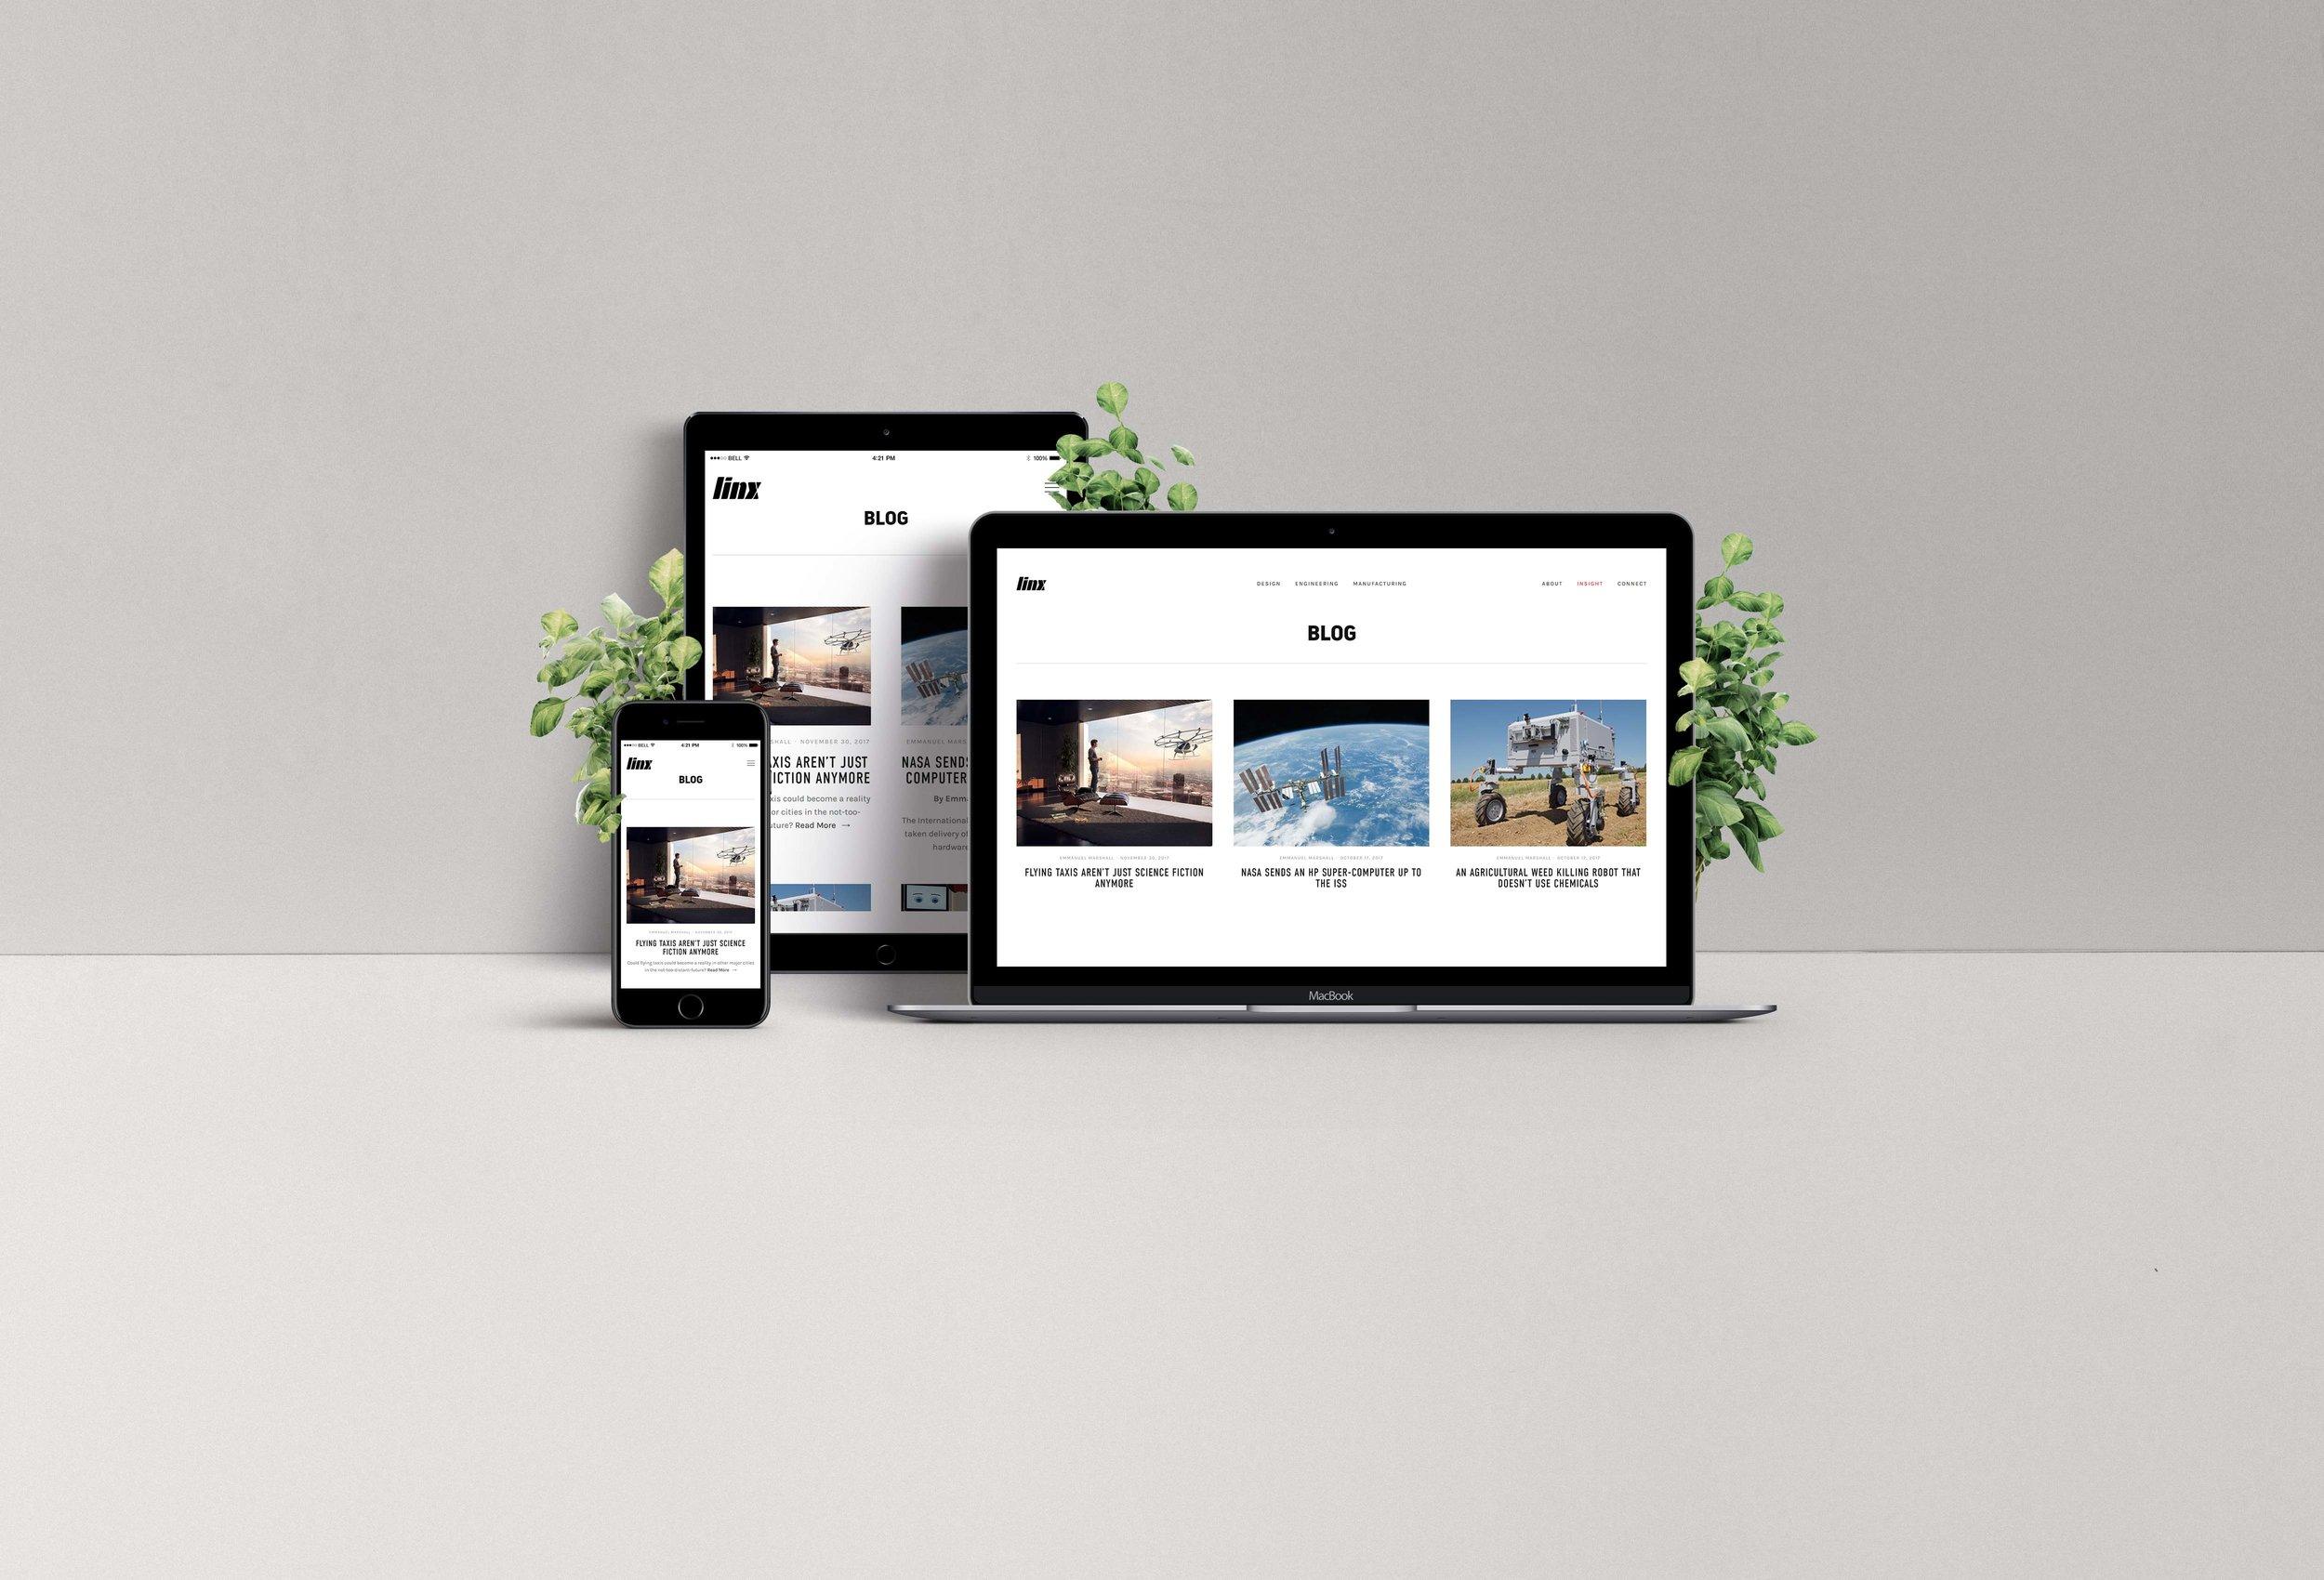 linx_web_showcase.jpg